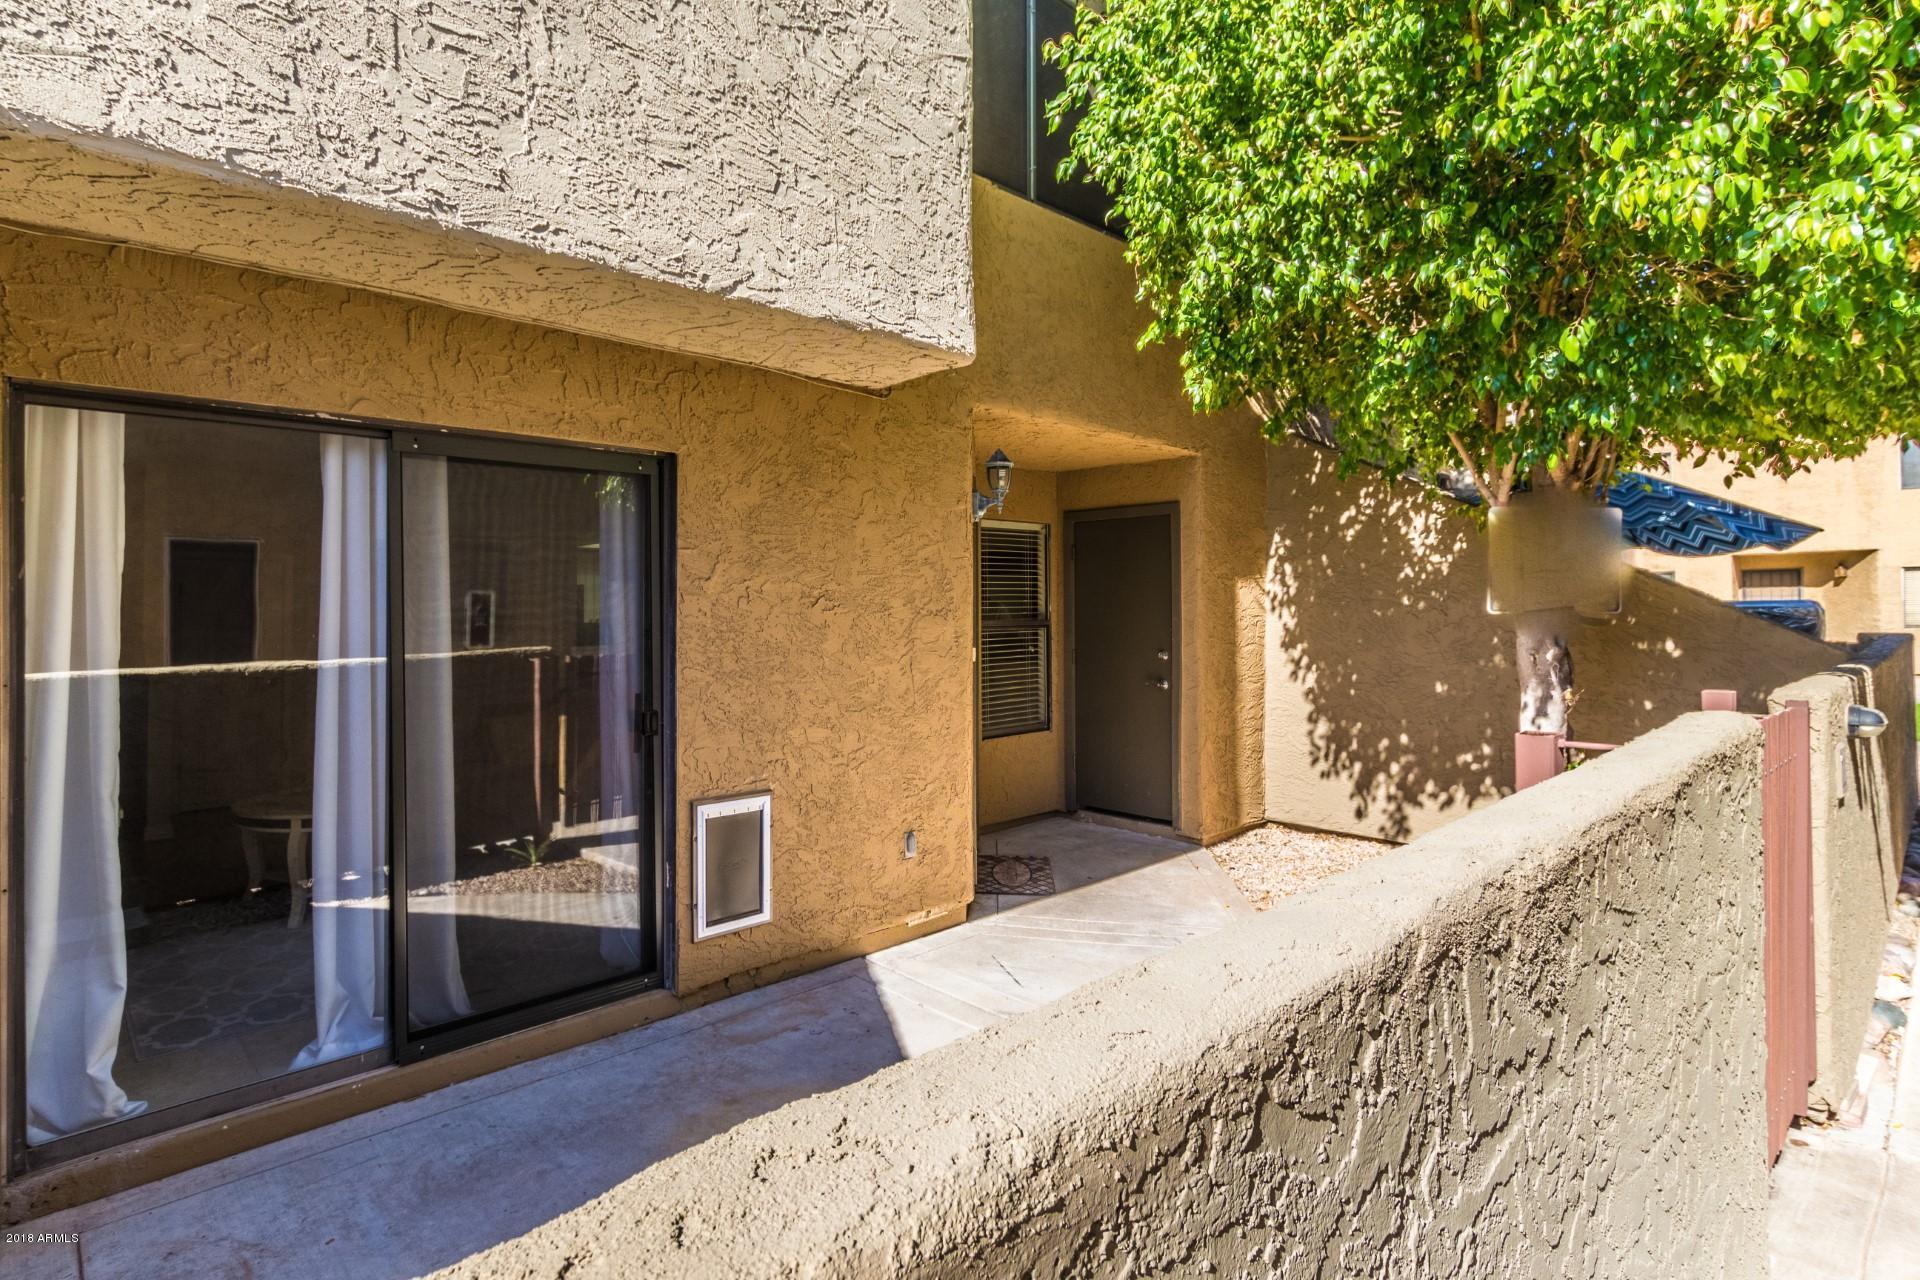 Photo of 2040 S LONGMORE -- #22, Mesa, AZ 85202